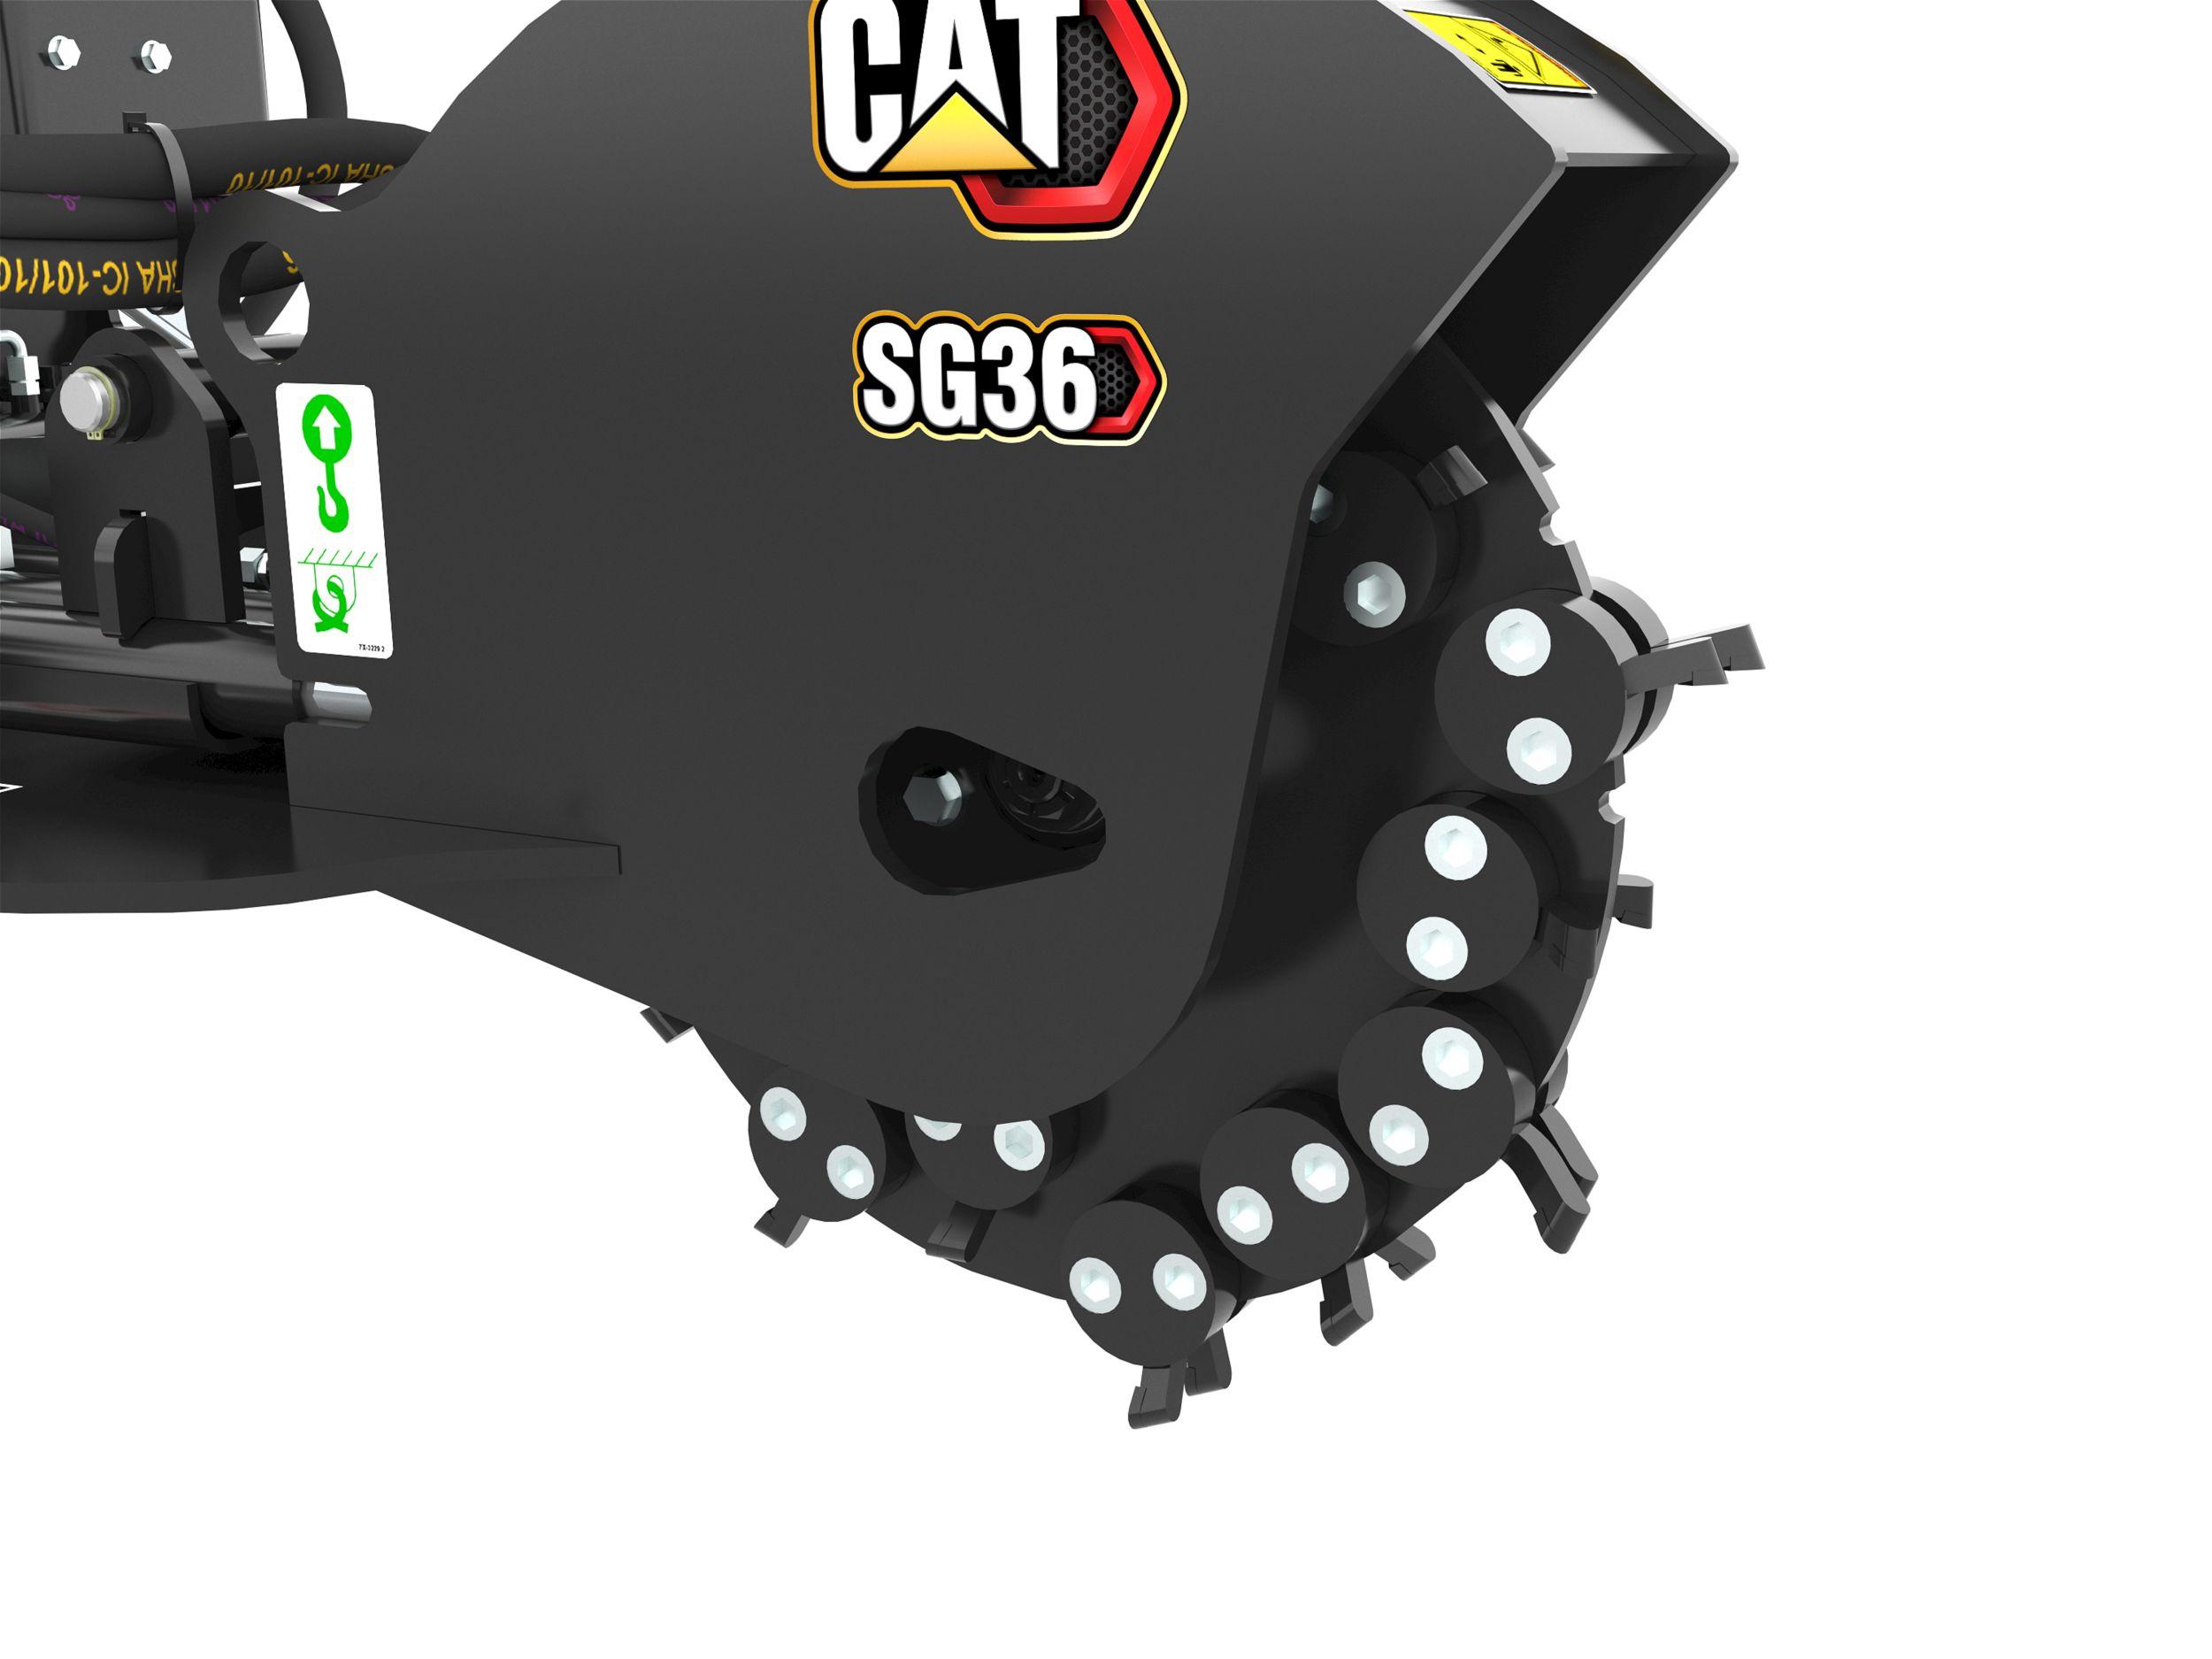 Cat Sg18b Stump Grinder Caterpillar 236 Engine Diagram Heavy Duty Cutting Wheel